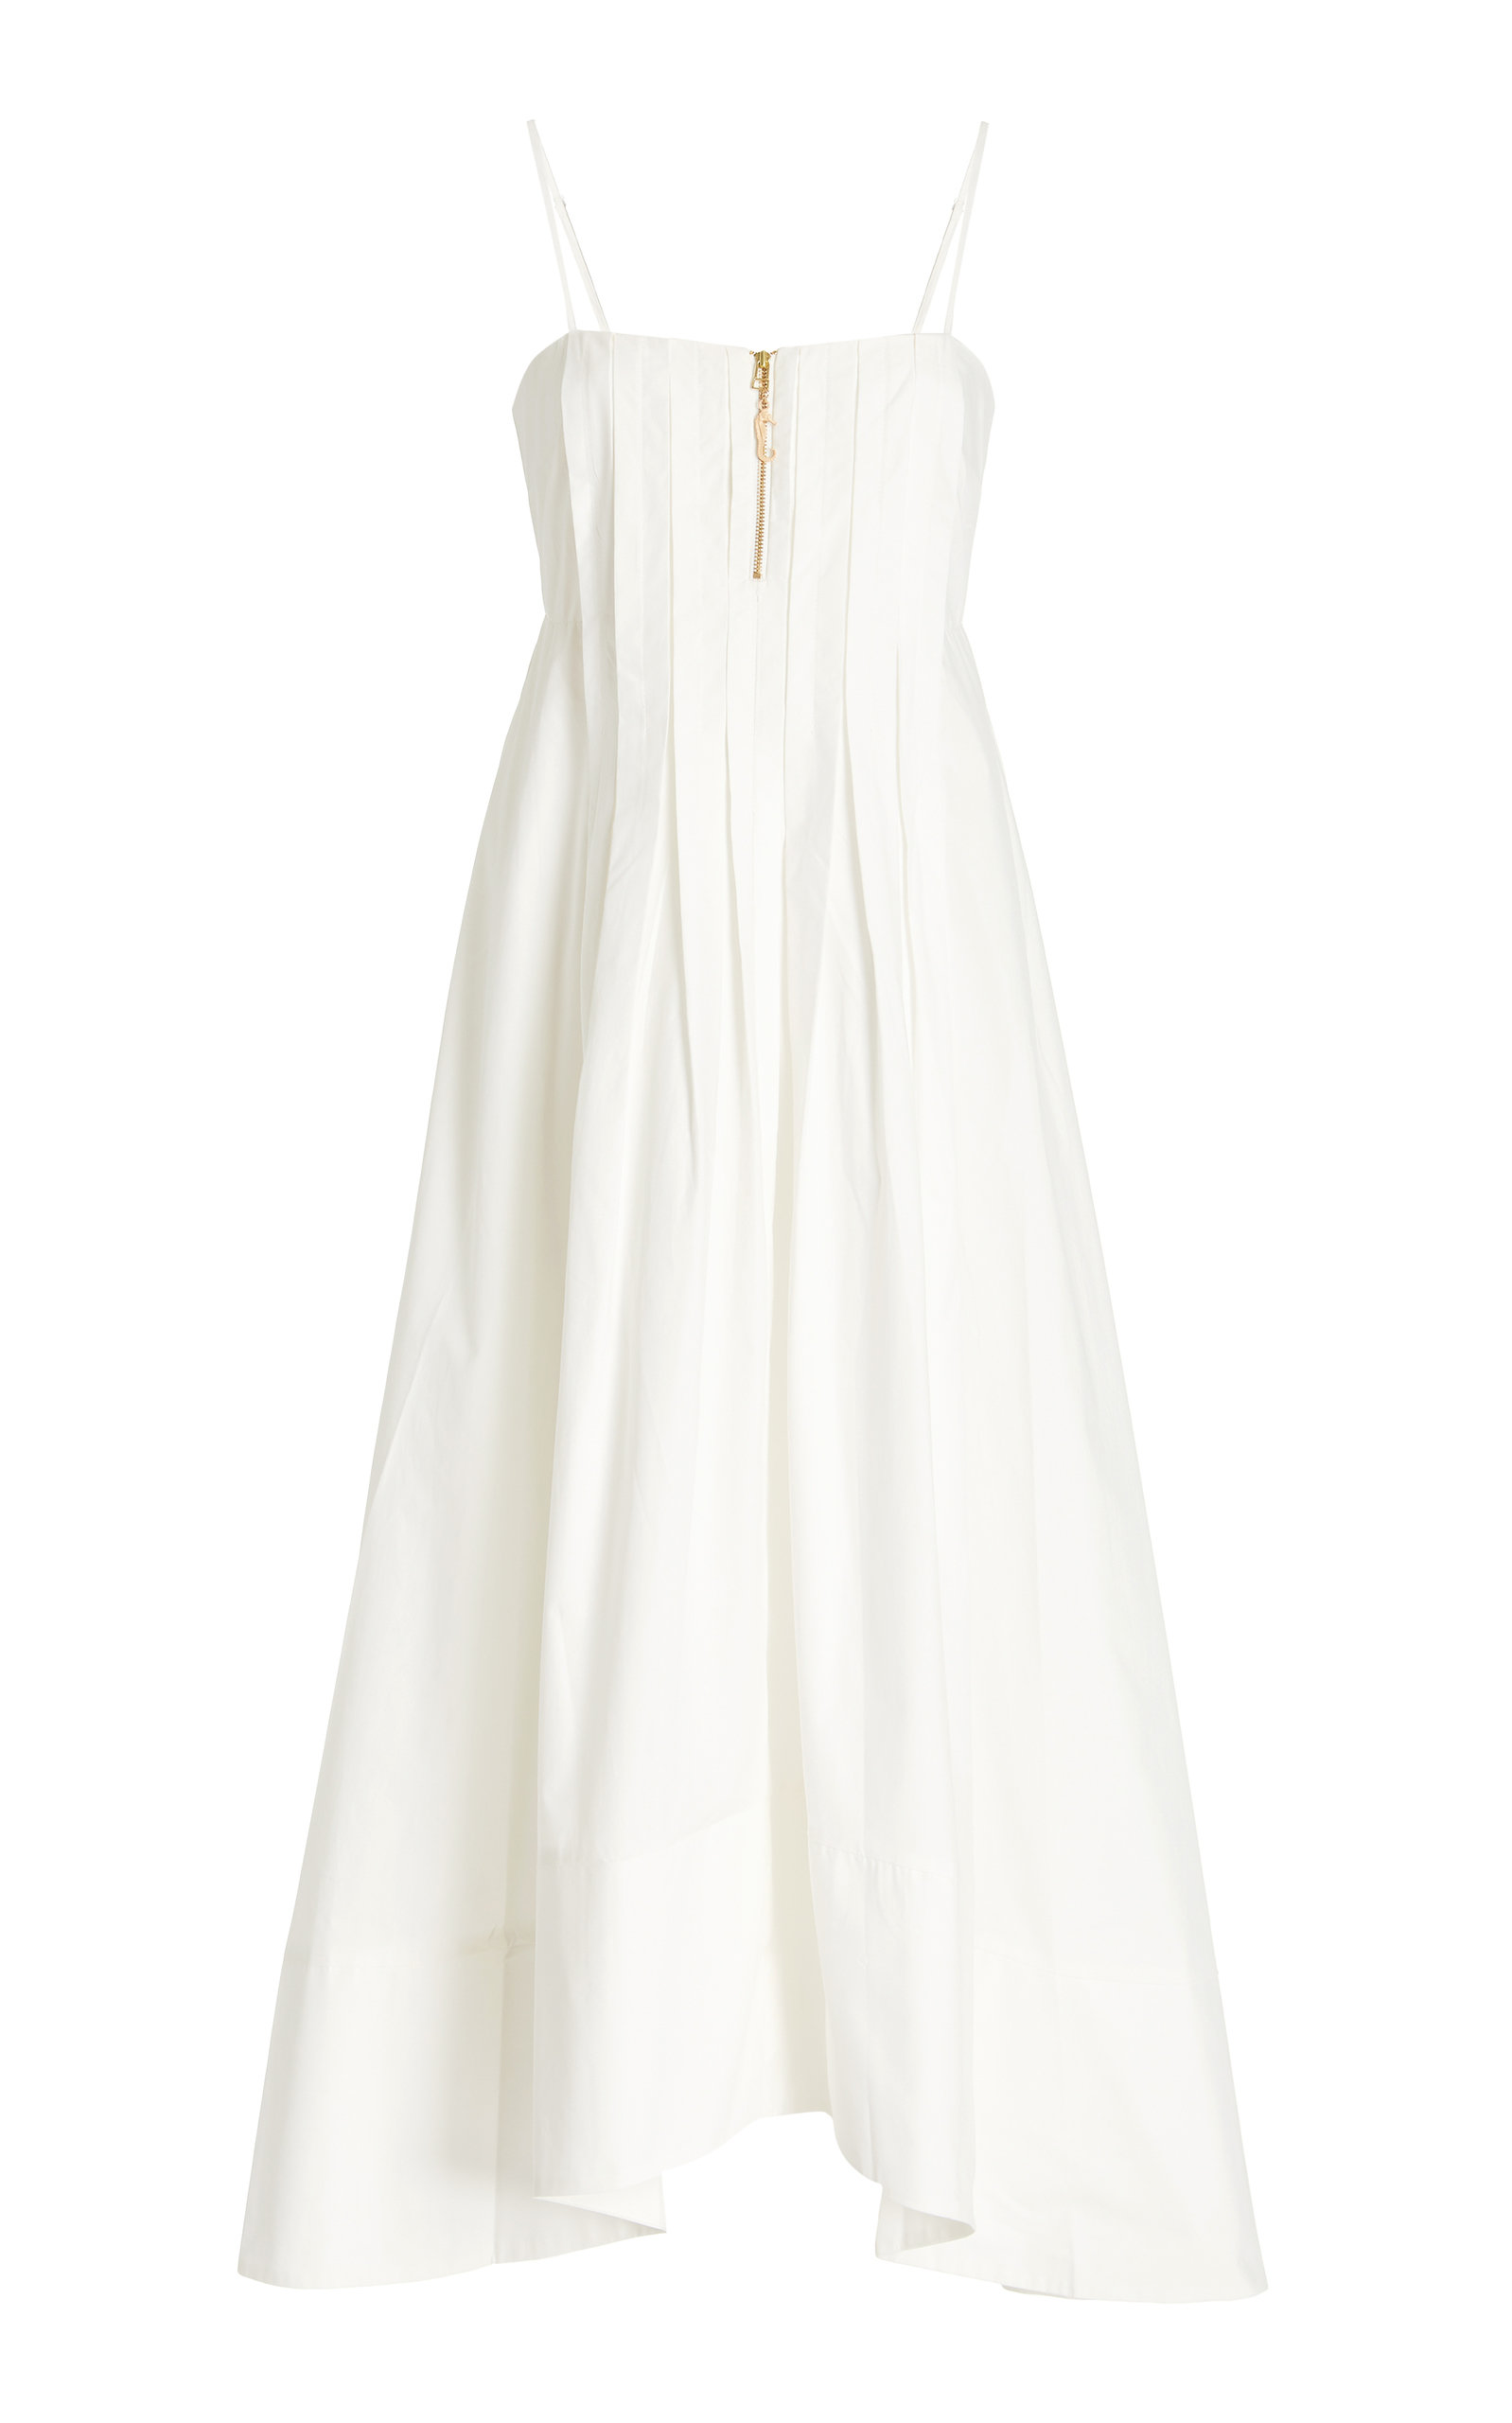 ALÉMAIS - Women's Selene Pleated Cotton Dress - White - Moda Operandi